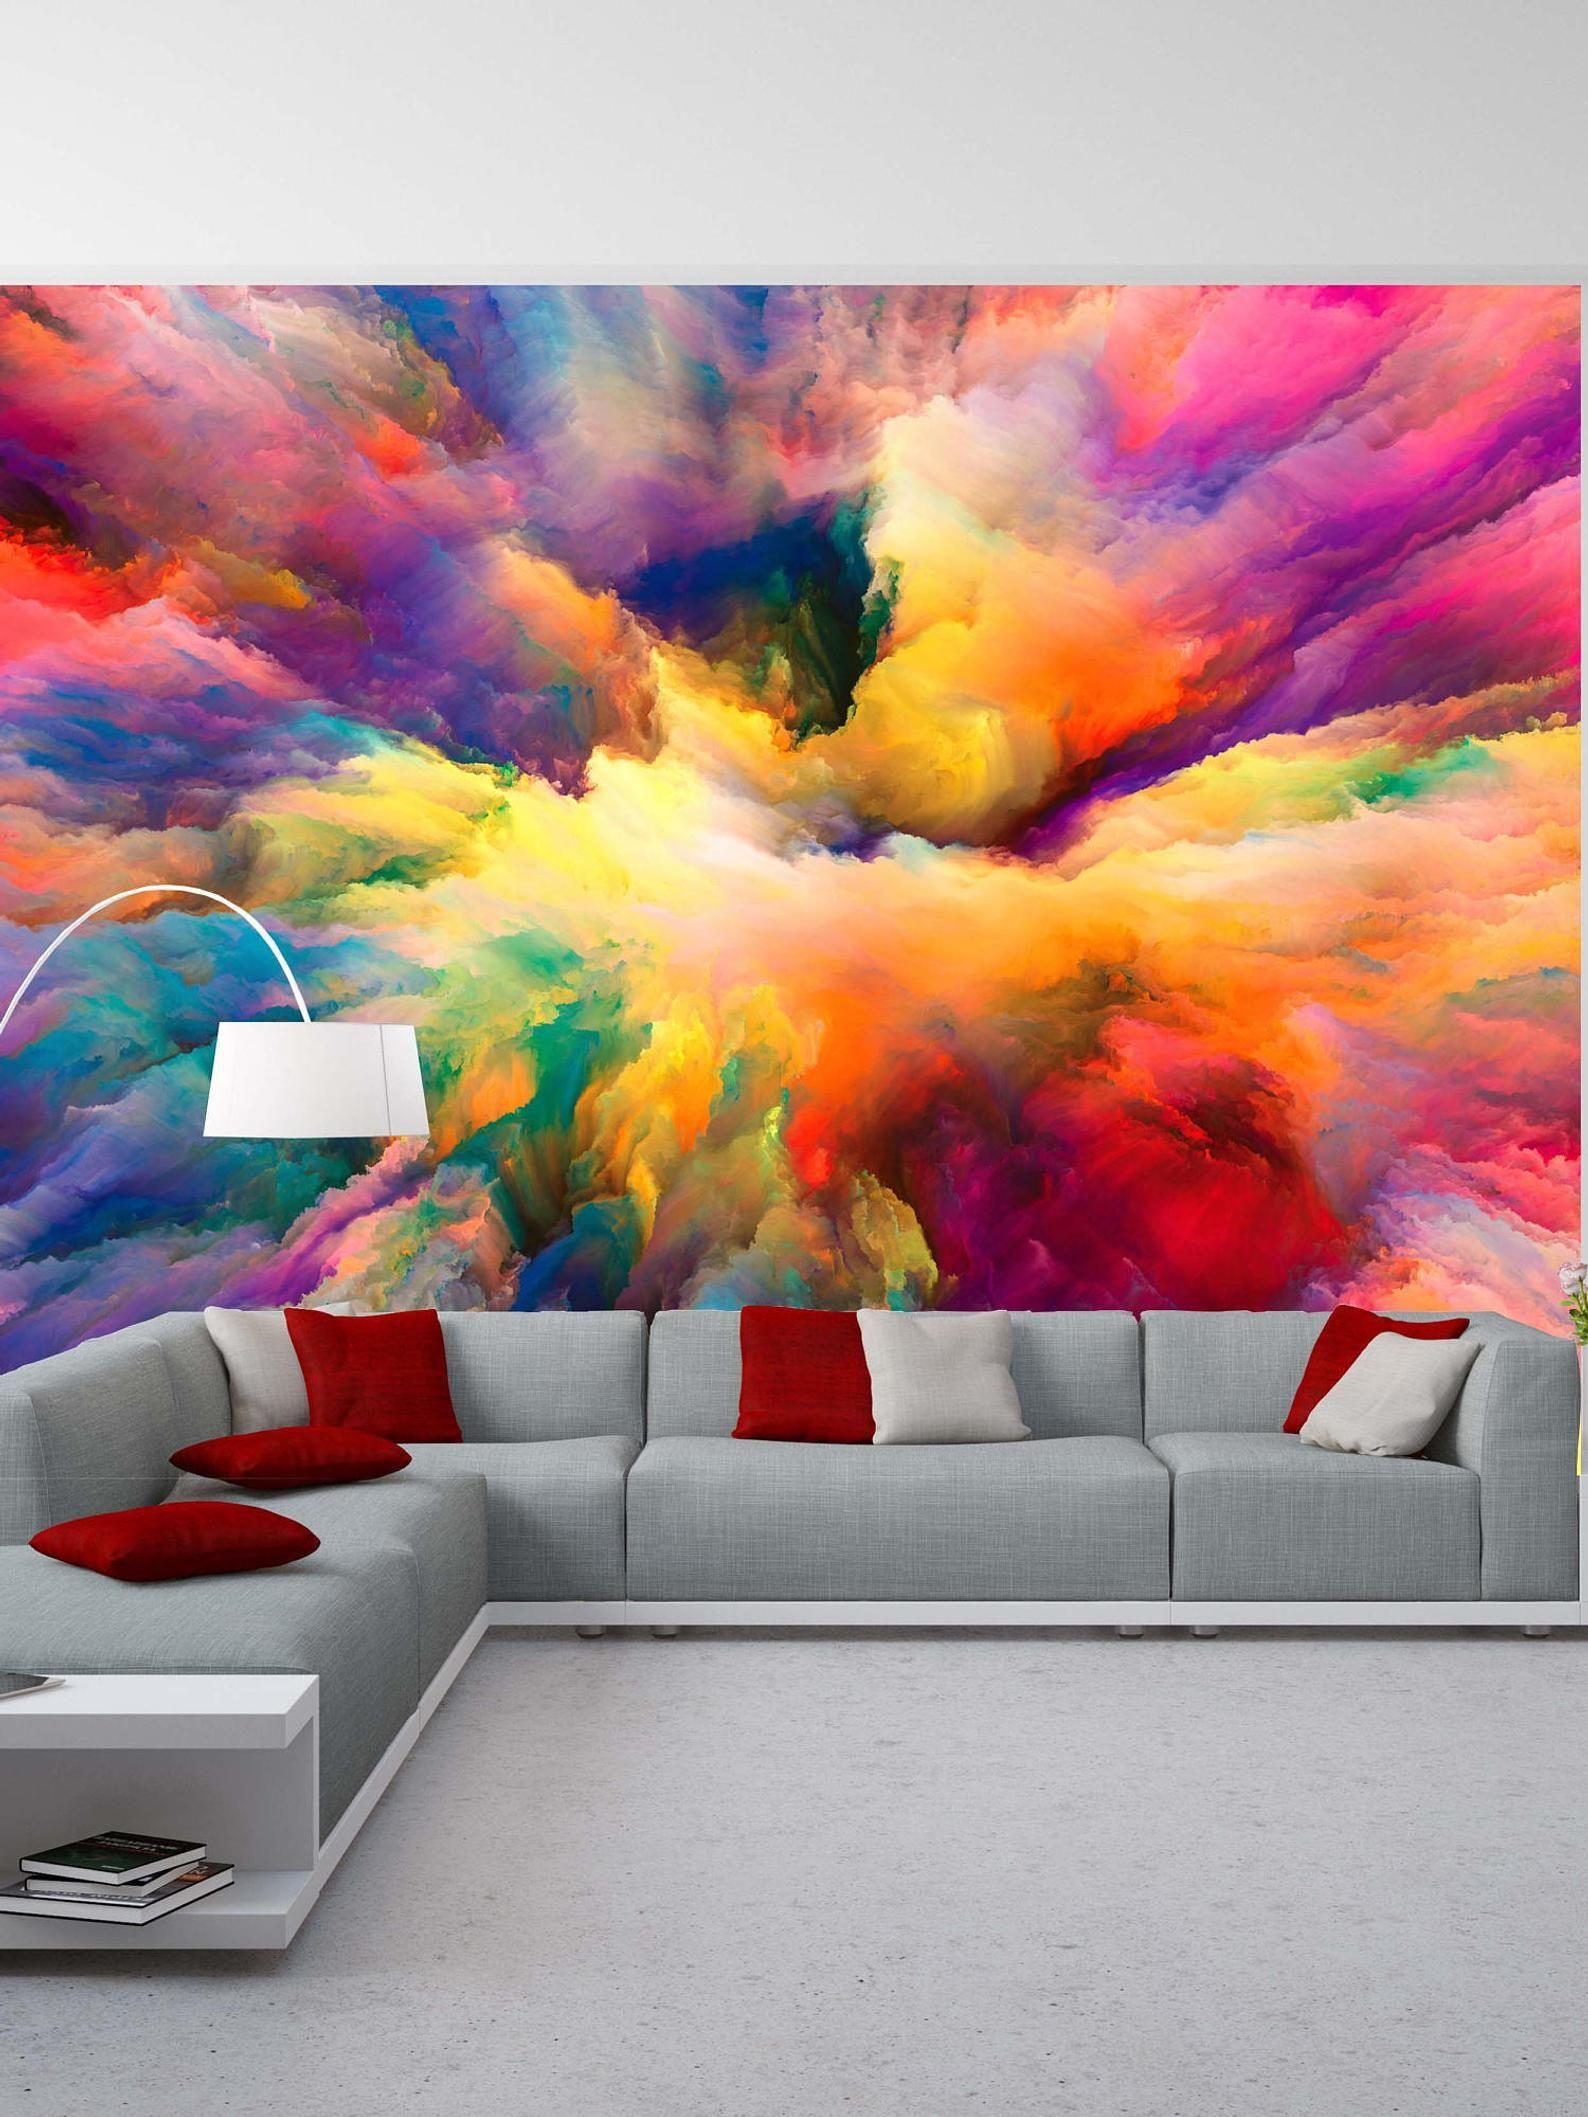 Removable Wallpaper Mural Peel & Stick Color Explosion